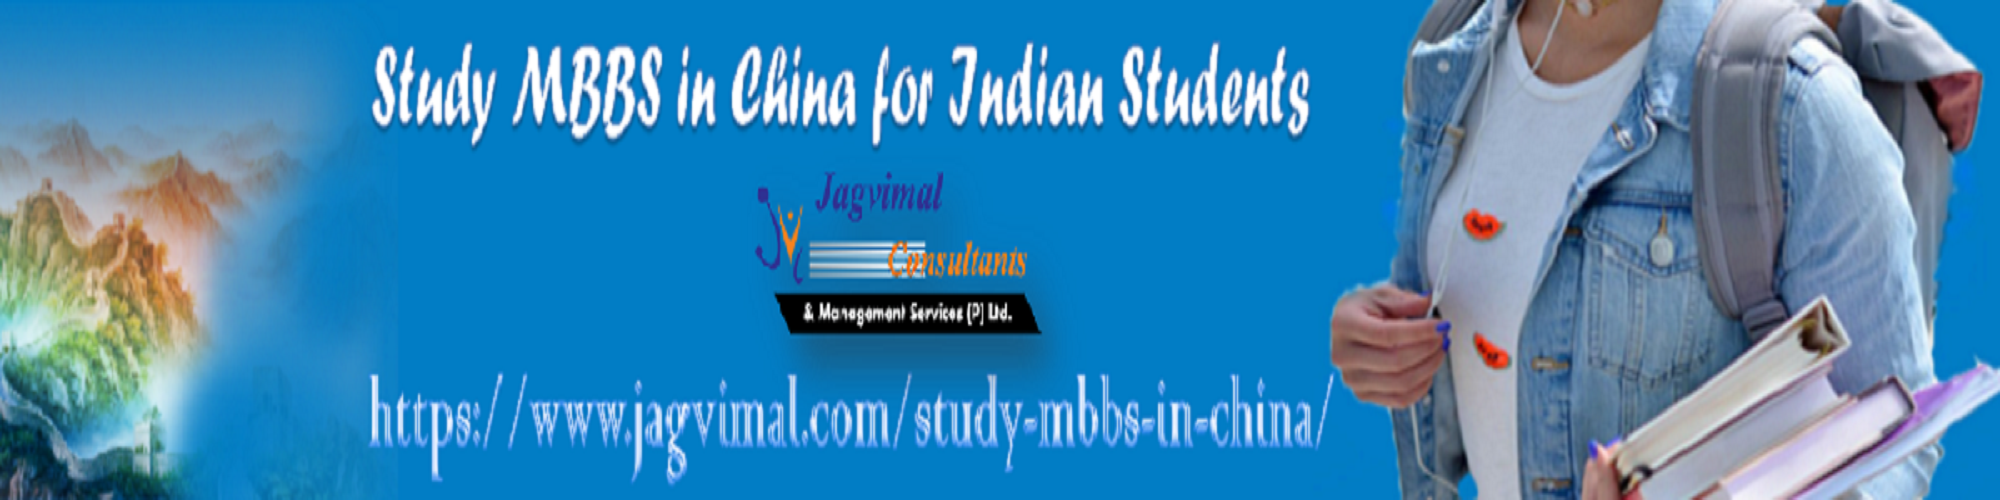 Jagvimal Consultants & Management Services (P) Ltd  | StartUs